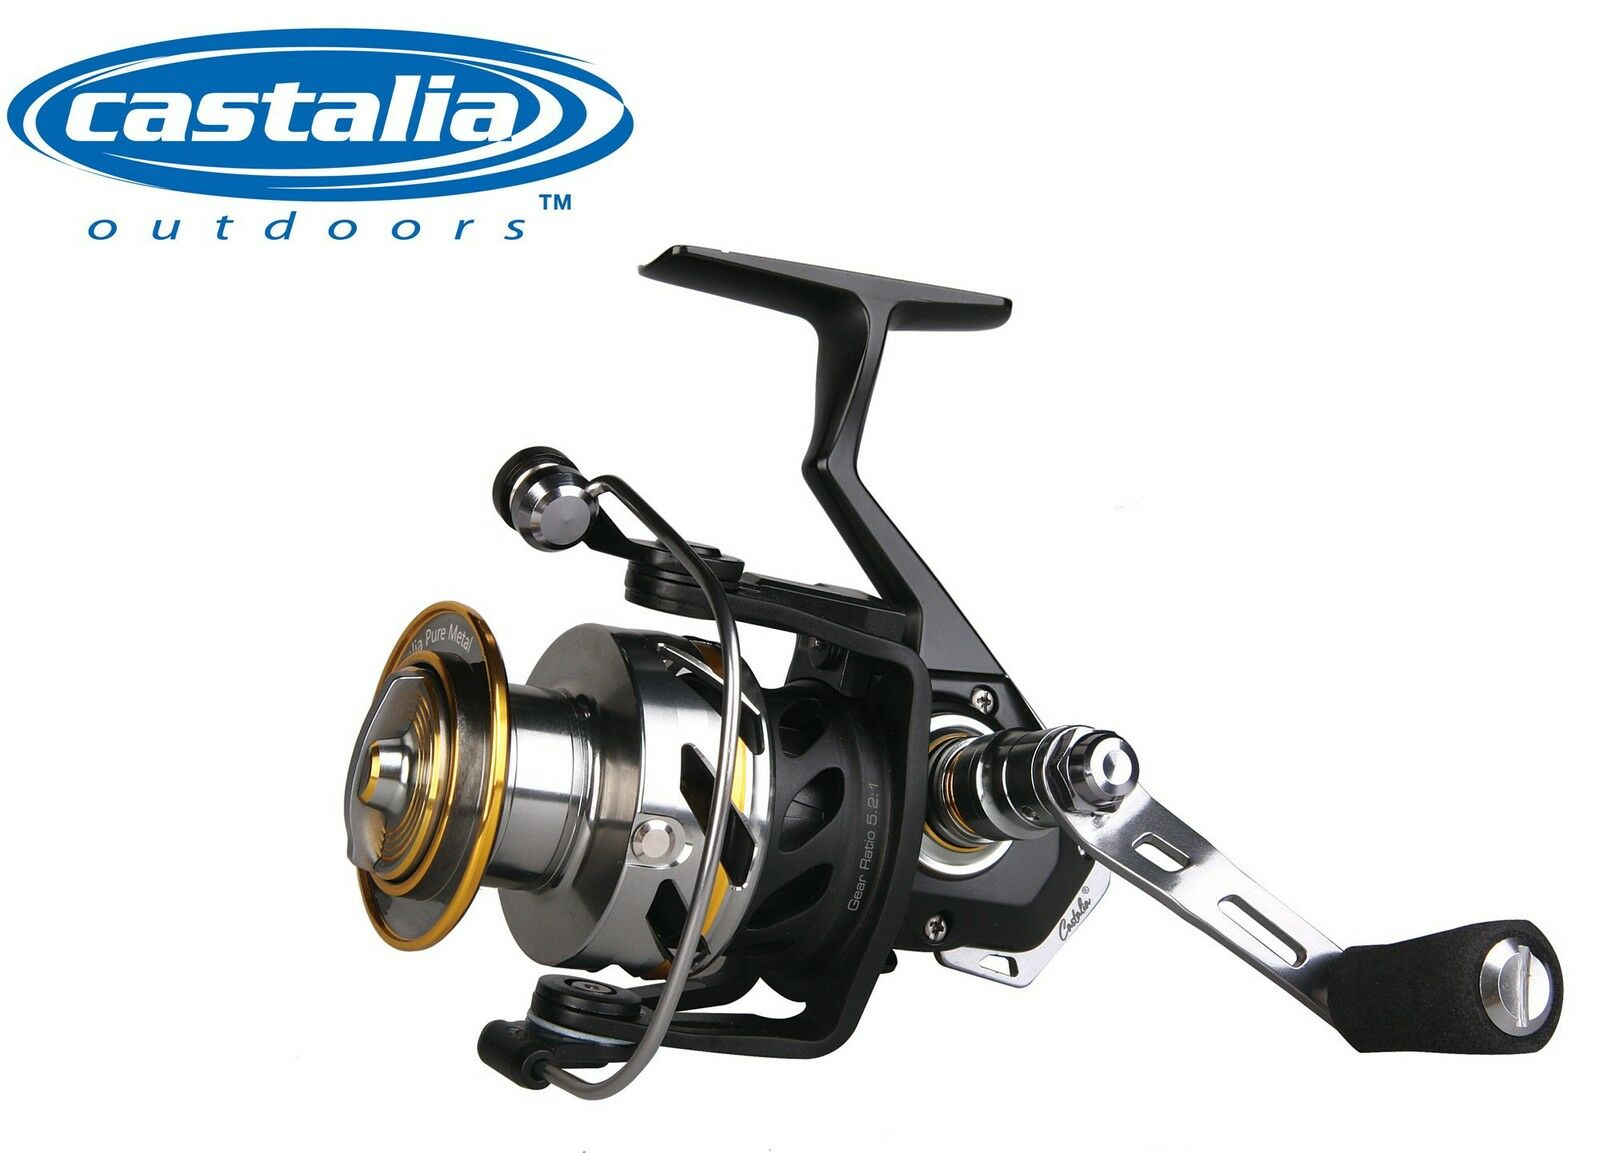 Castalia Pure Metal 4000FD 4000FD 4000FD - Stationärrolle zum Spinnfischen Angelrolle Rolle 245db9